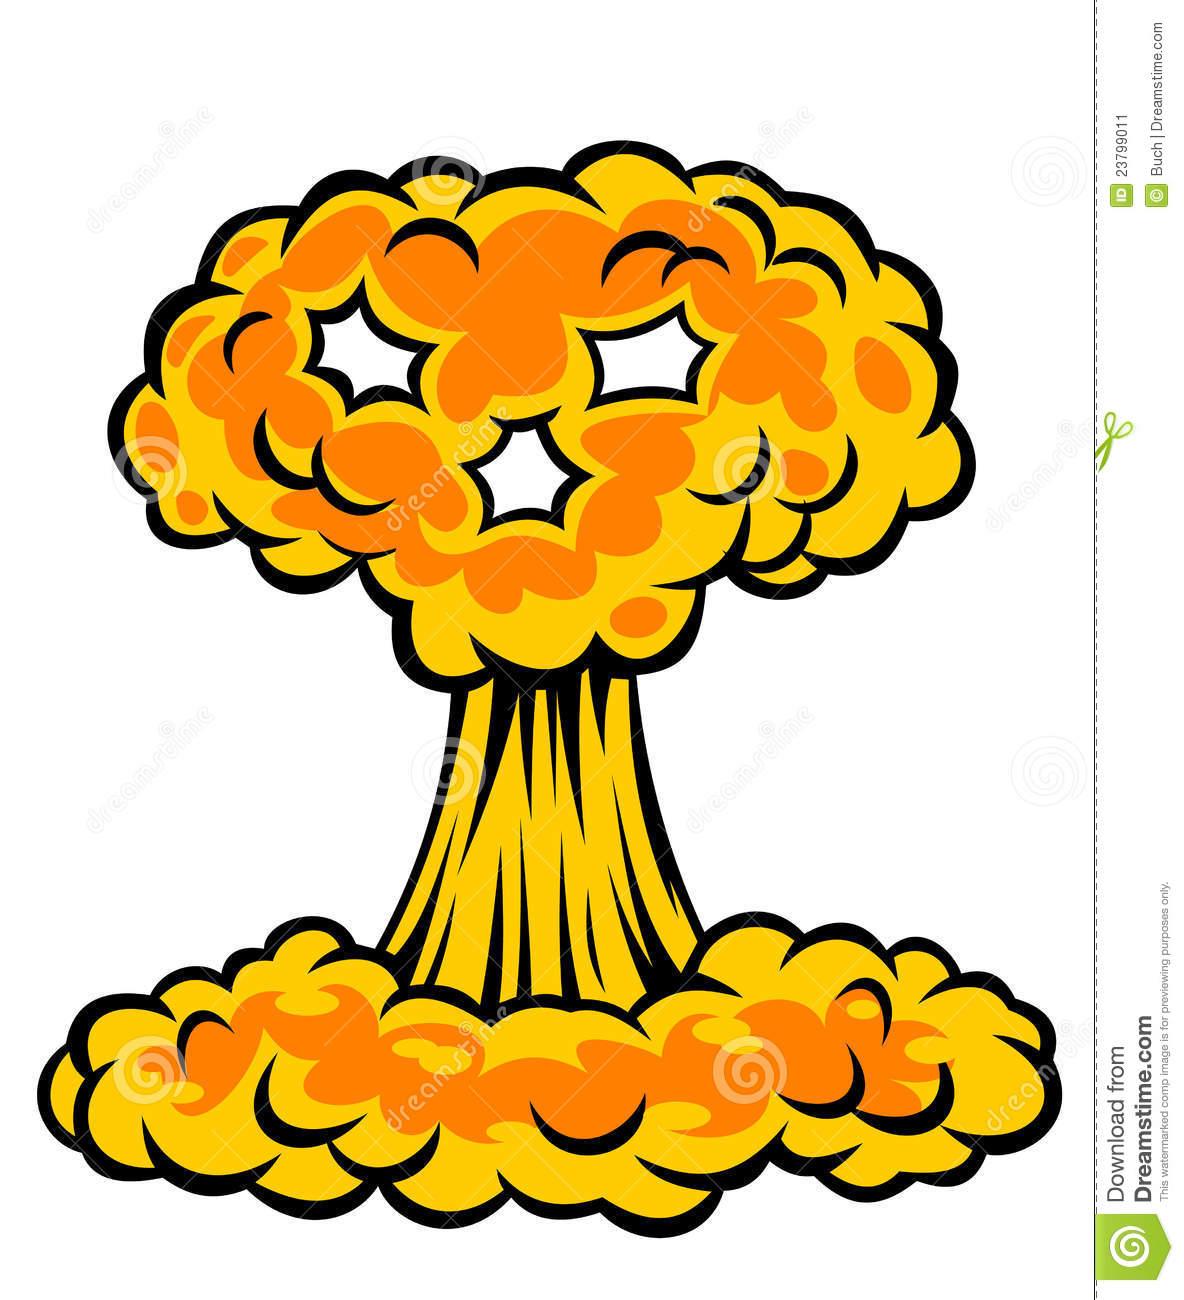 Nuke explosion clipart.